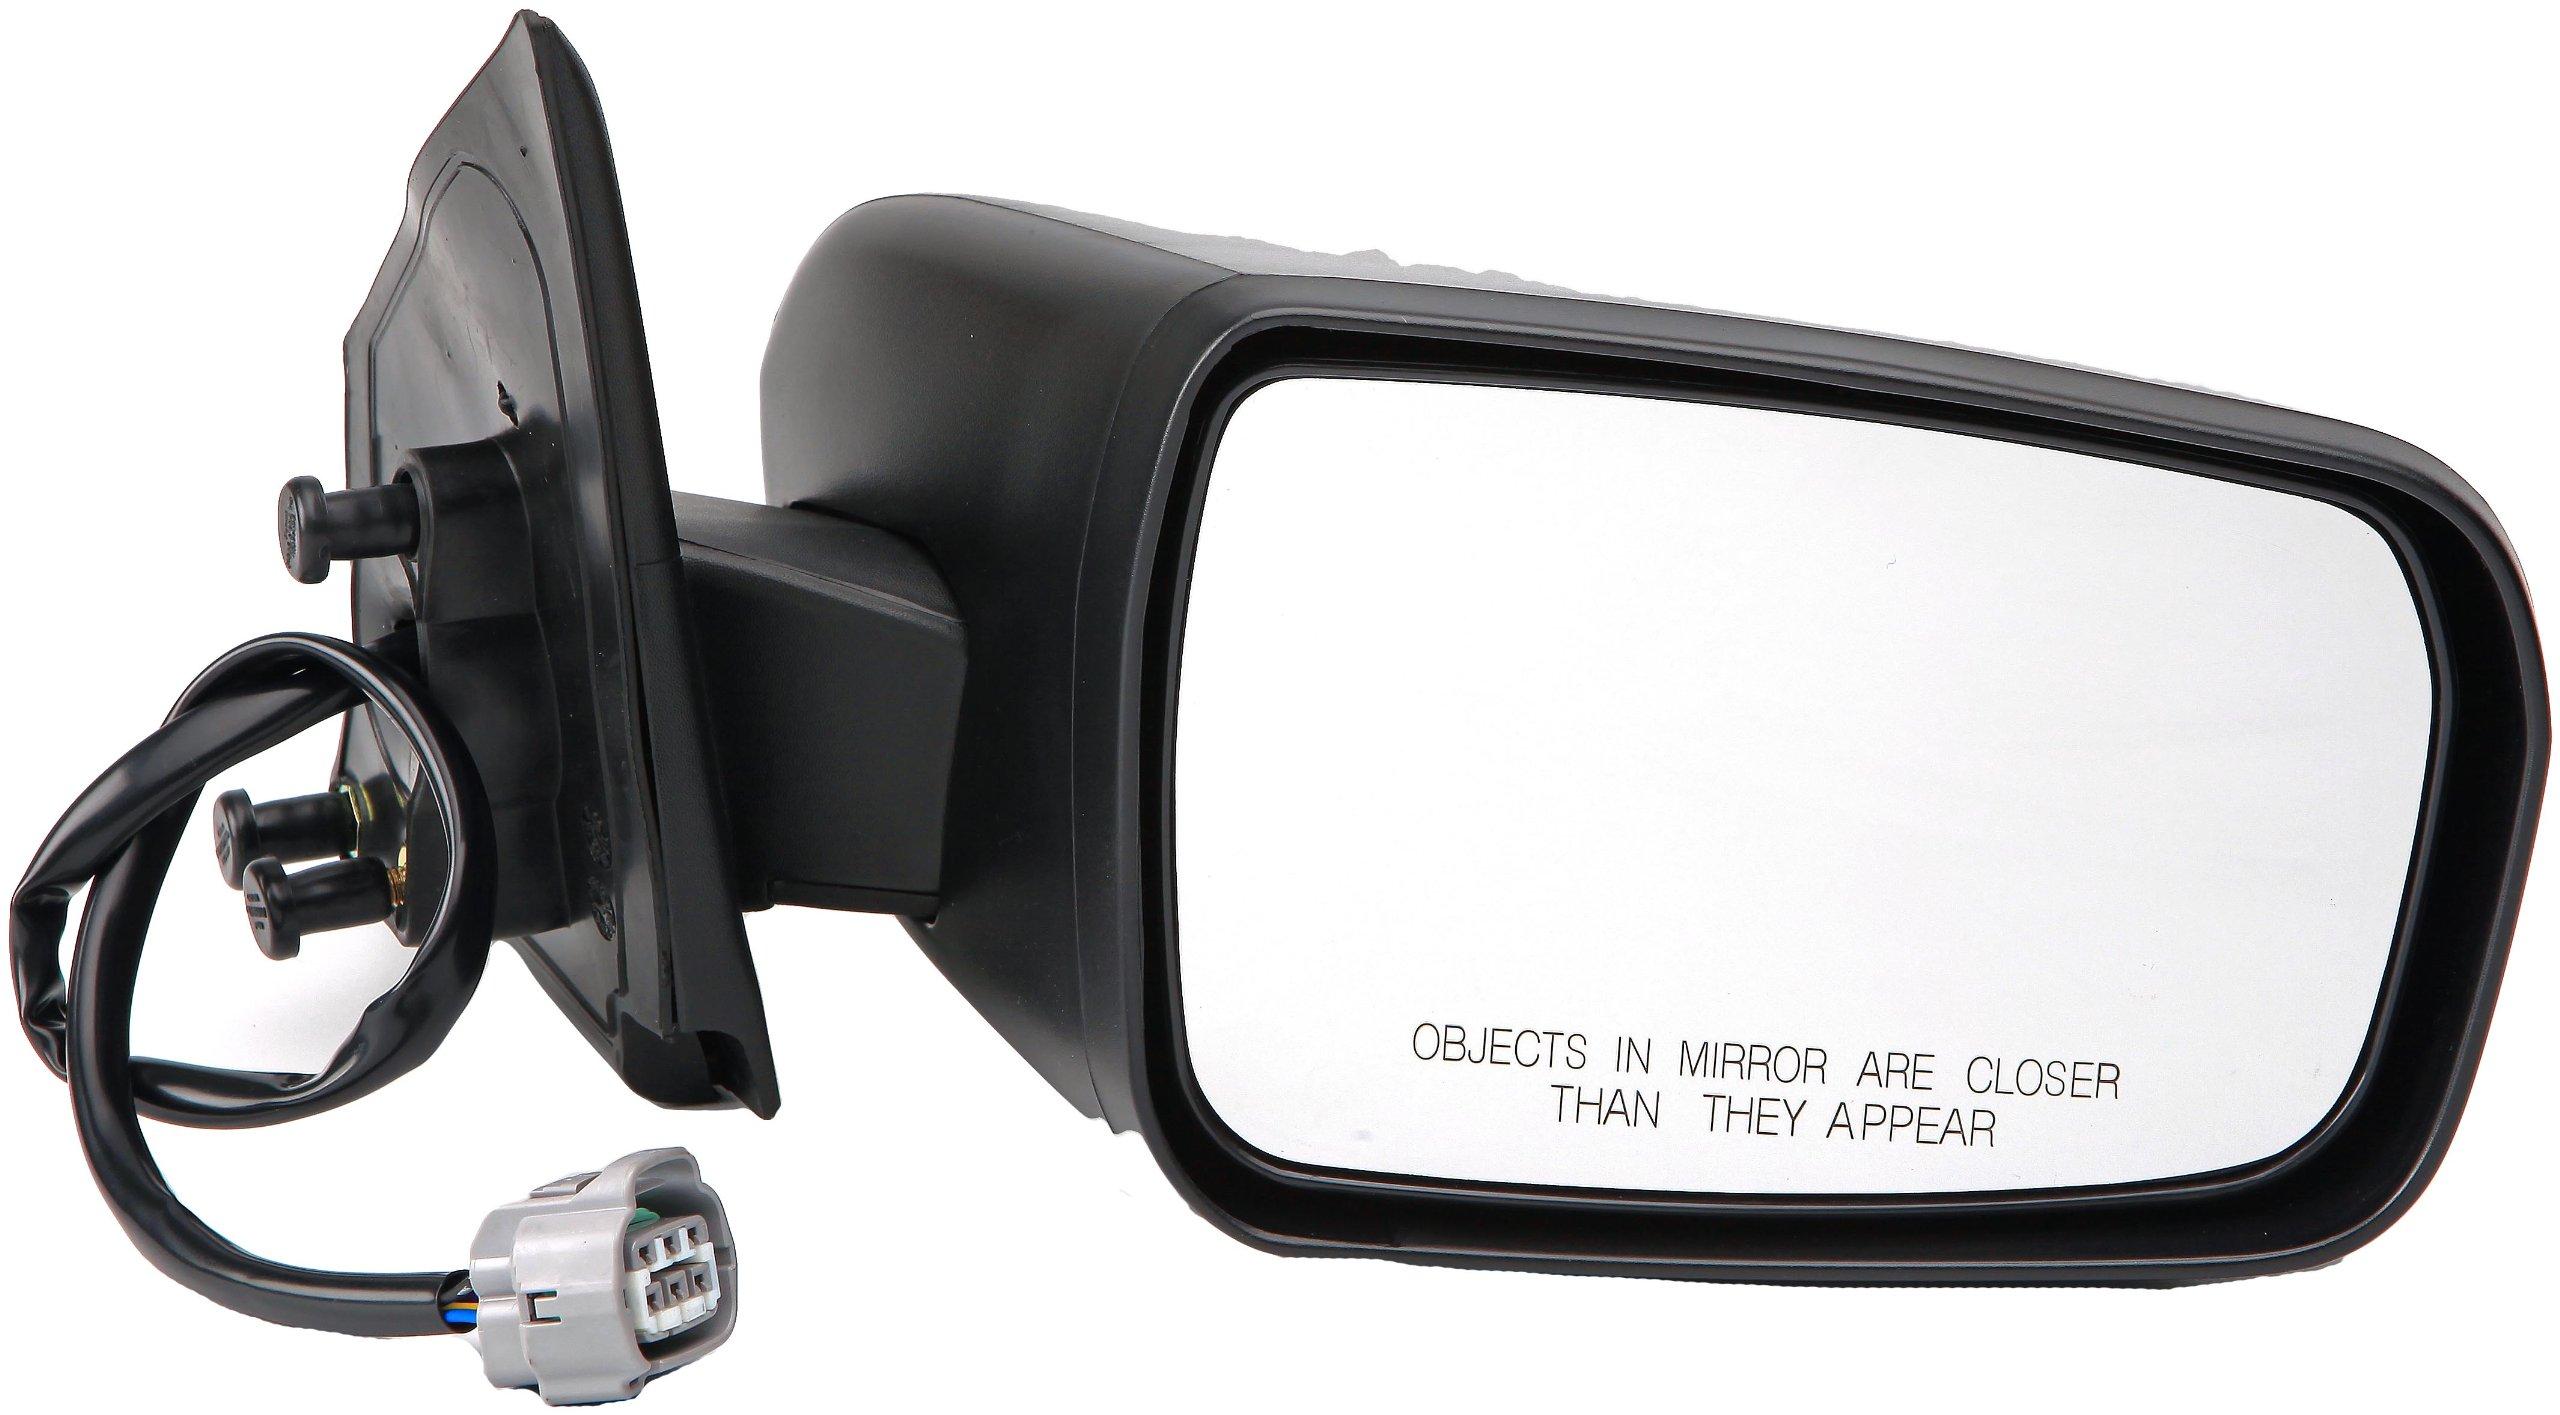 Dorman 955-1788 Mitsubishi Galant Passenger Side, Power Folding, Extendable Replacement Mirror